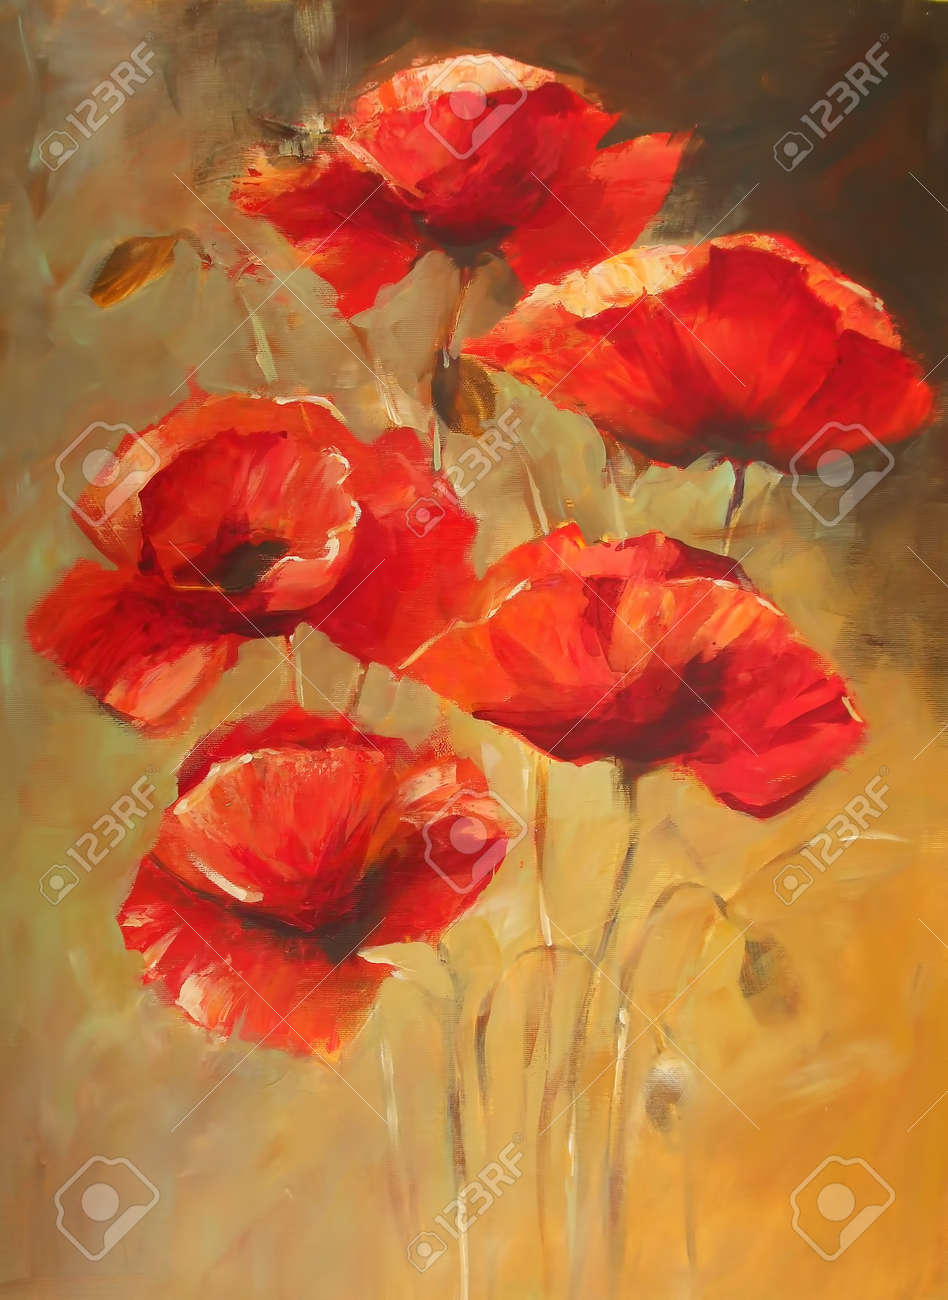 Poppy flowers handmade oil painting on canvas stock photo picture poppy flowers handmade oil painting on canvas stock photo 55509846 mightylinksfo